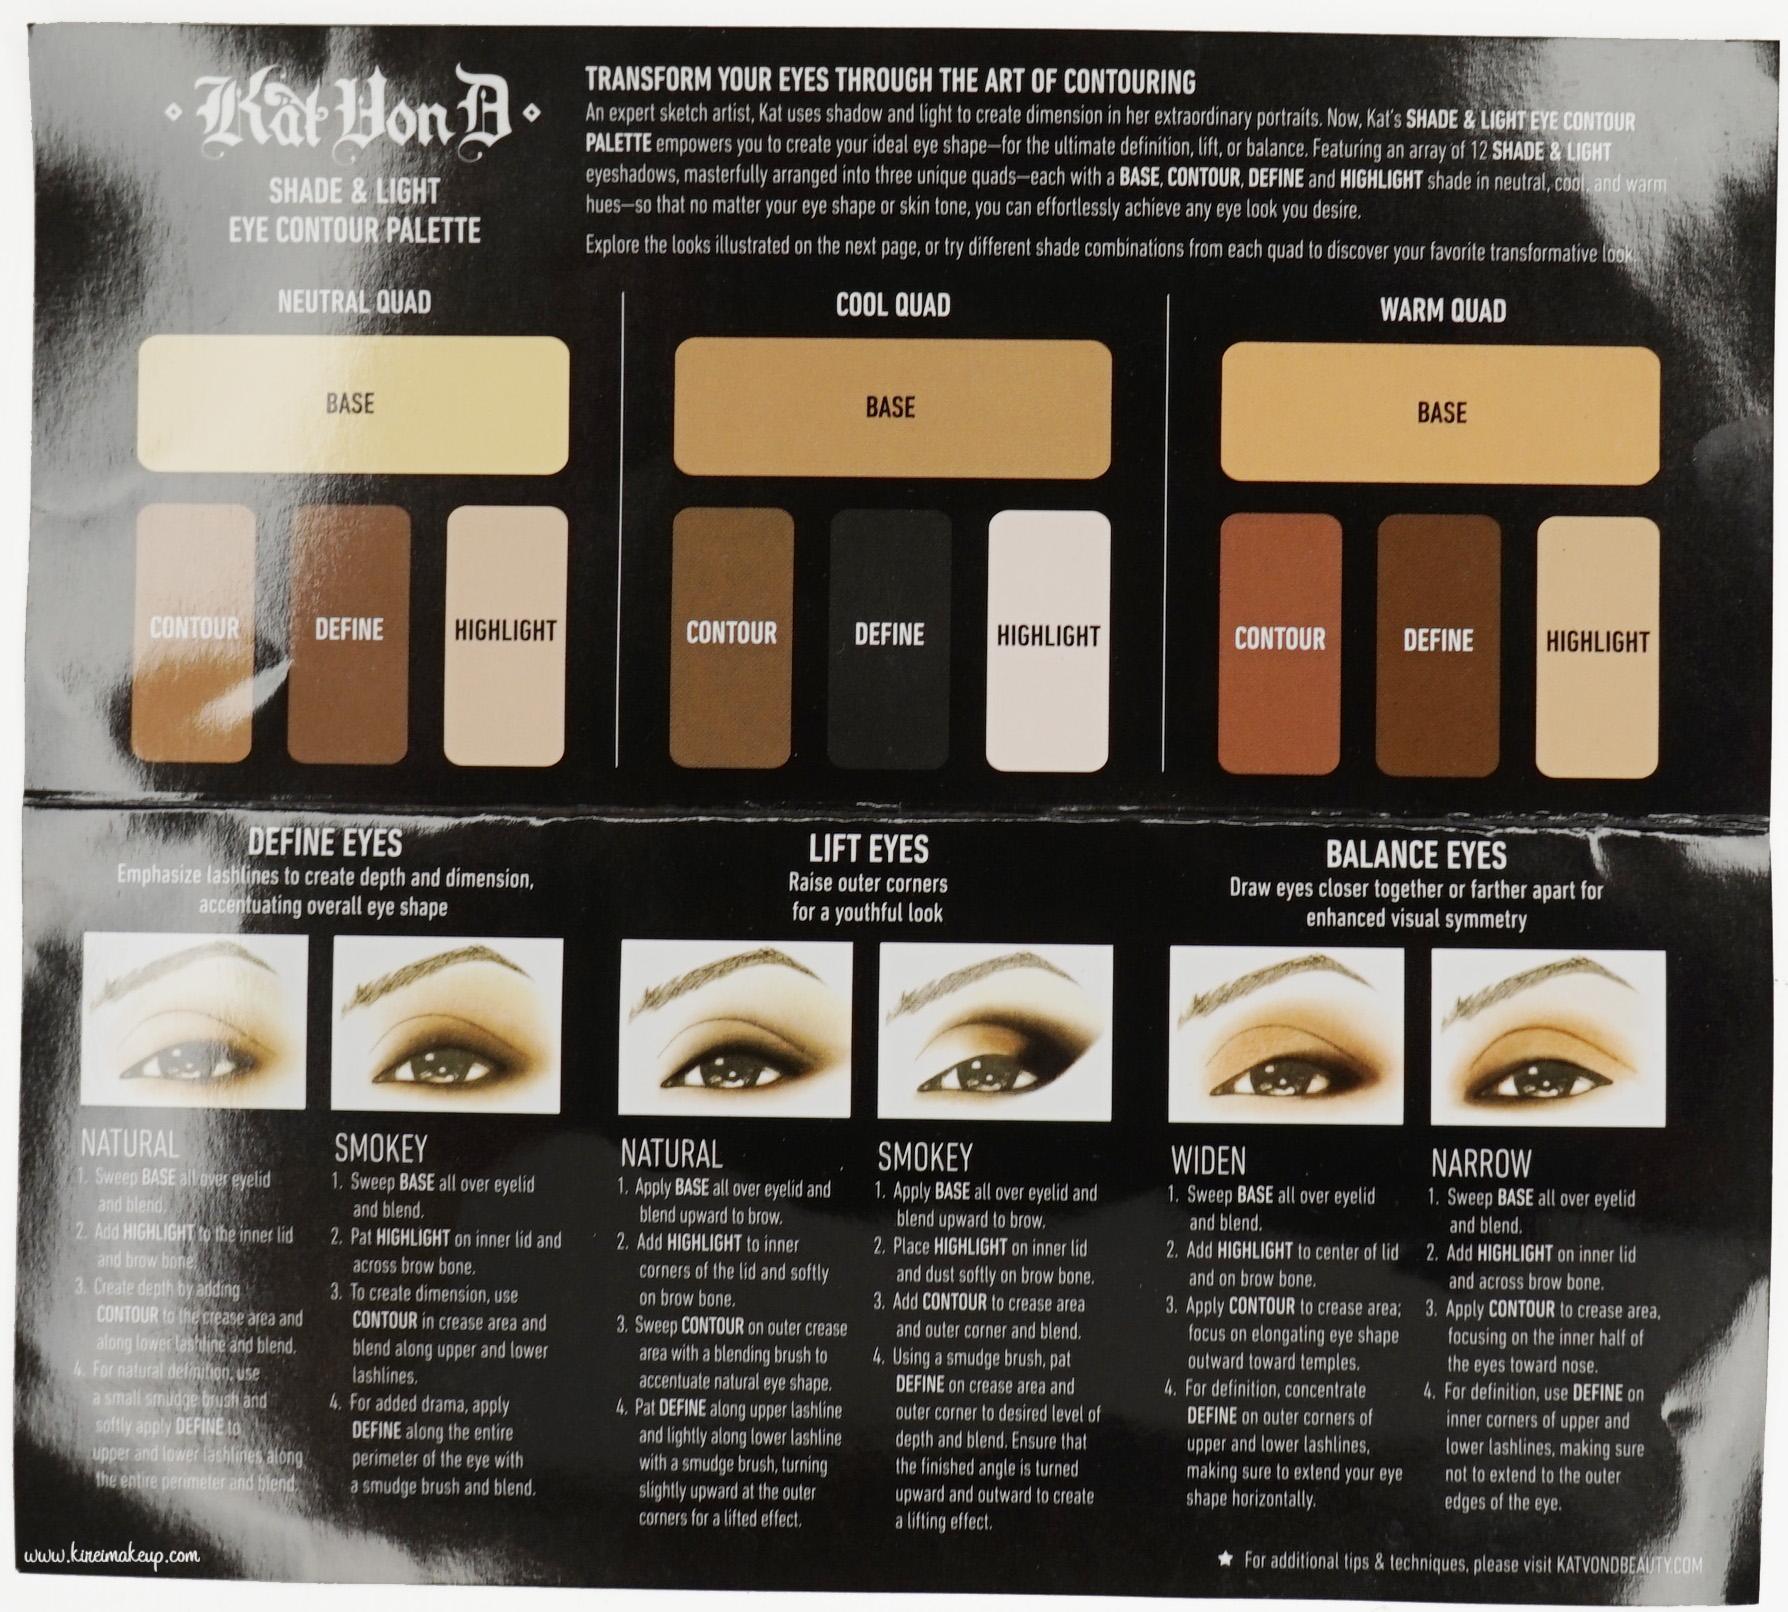 Kvd Shade Amp Light Eye Contour Palette Review Kirei Makeup